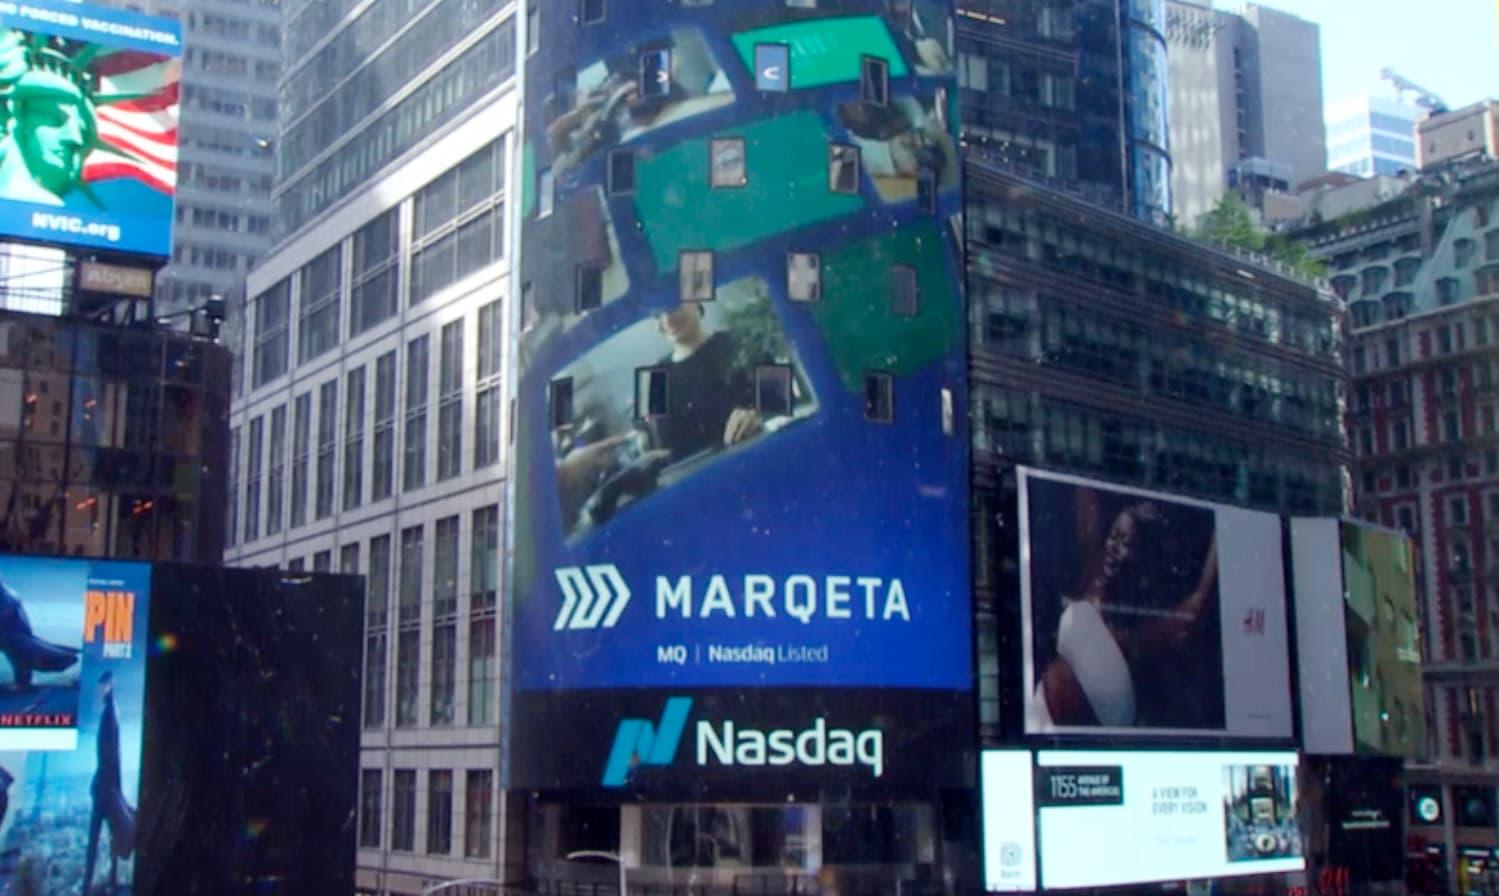 Marqeta jumps 20% in Nasdaq debut valuing fintech company at $17 billion – CNBC